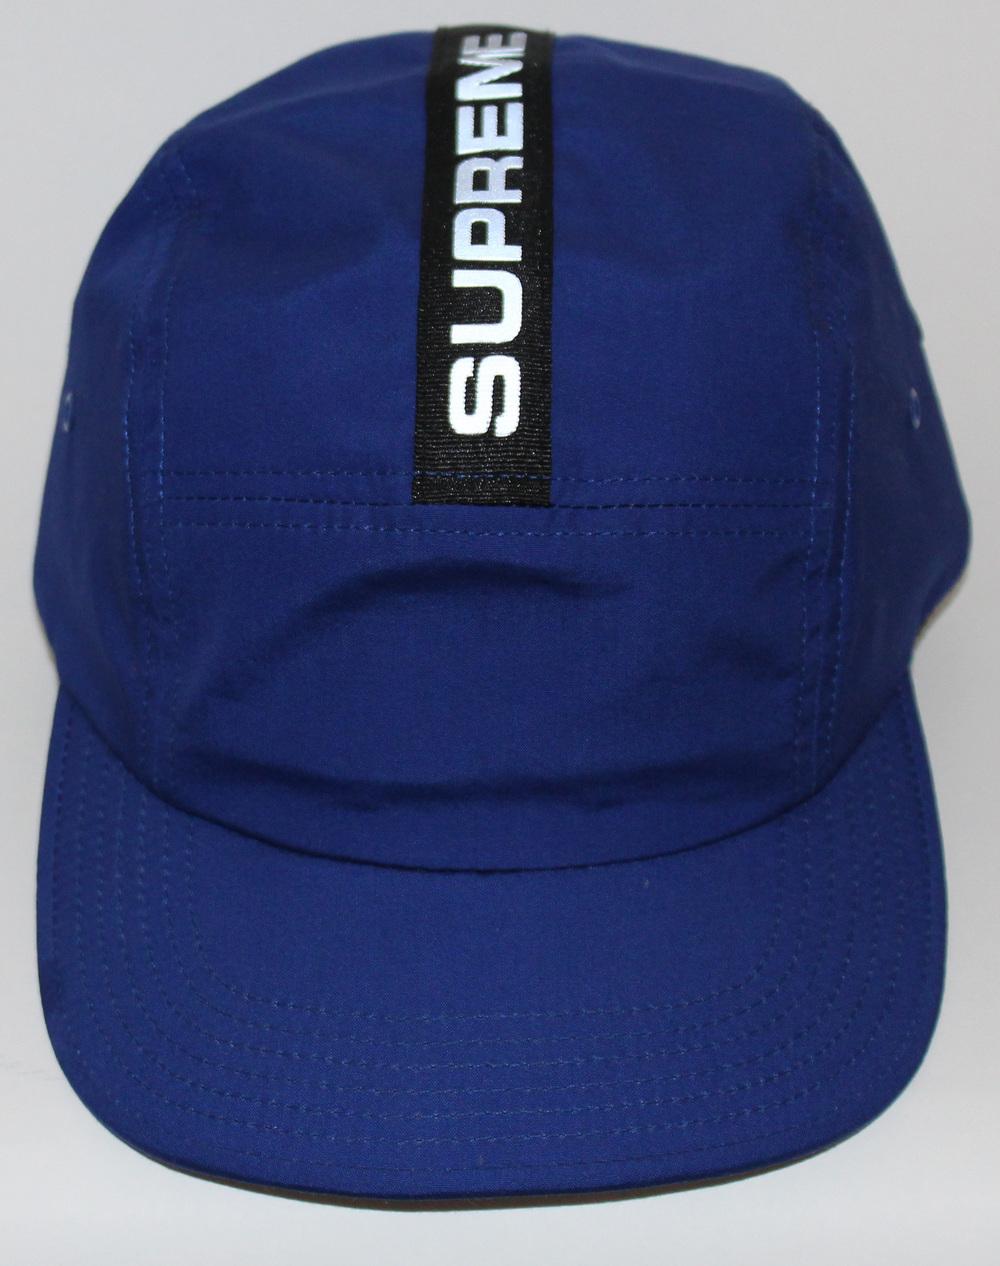 0d29ec52faf Supreme Reflective 5 Panel Royal Blue Camp Hat F W 14 — Roots